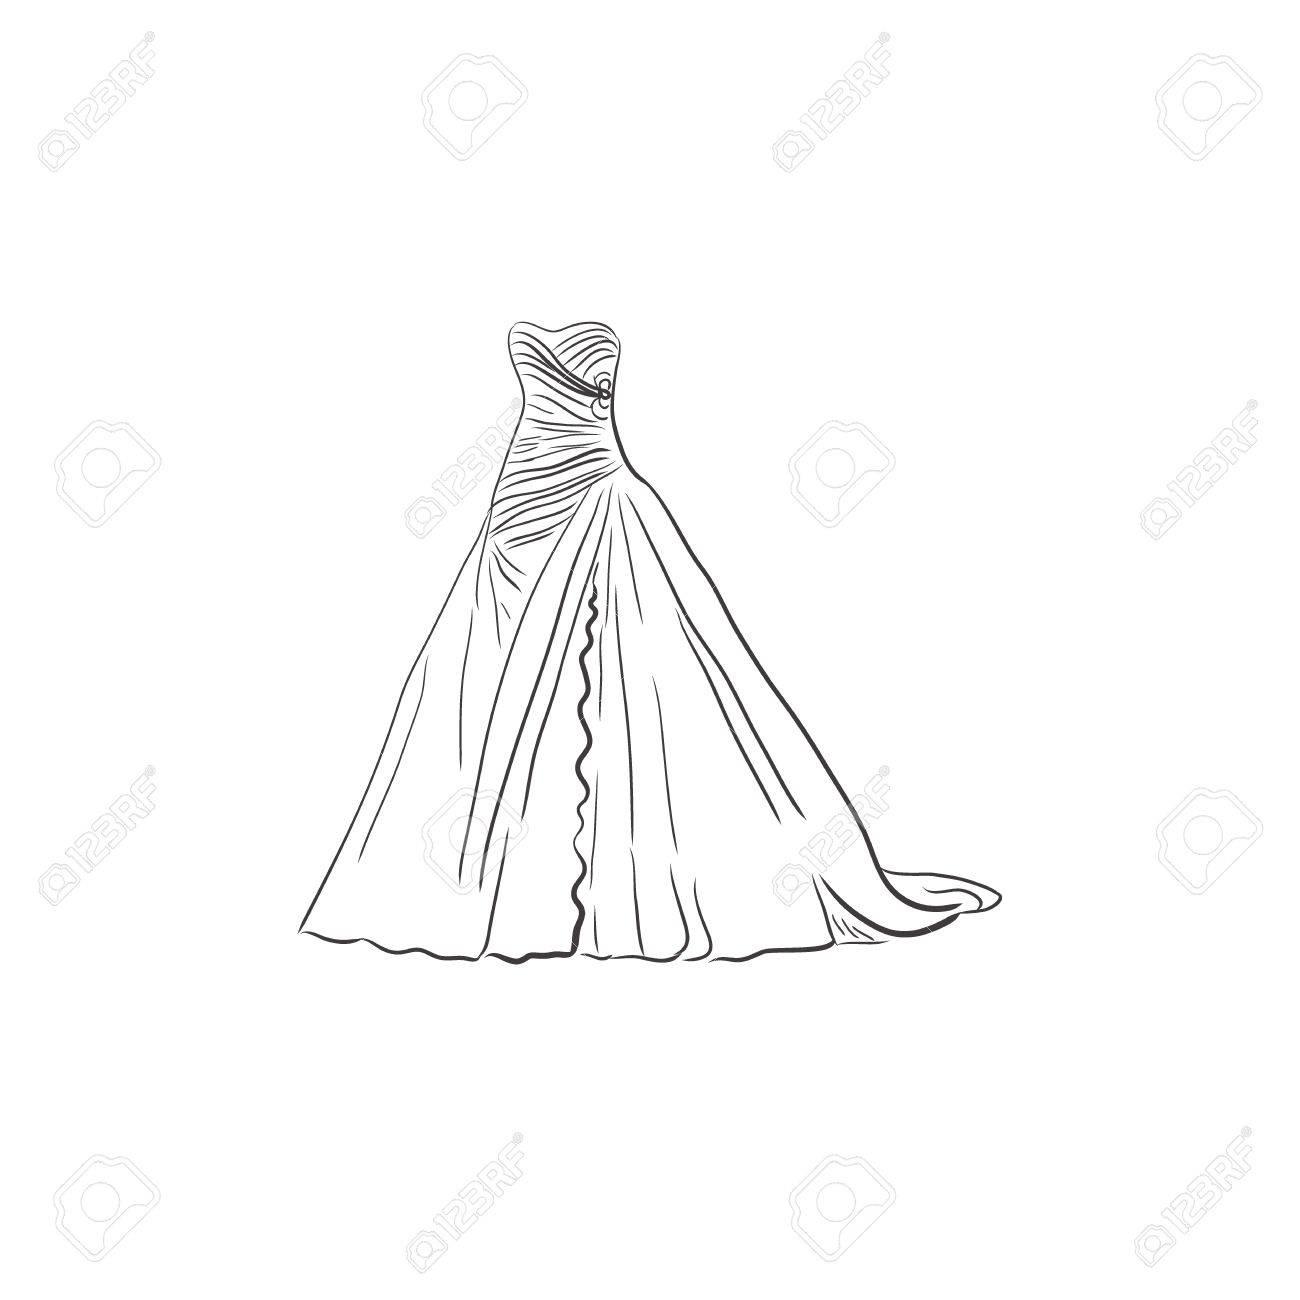 1300x1300 Wedding Dress, Sketch Design, Vector Illustration Royalty Free